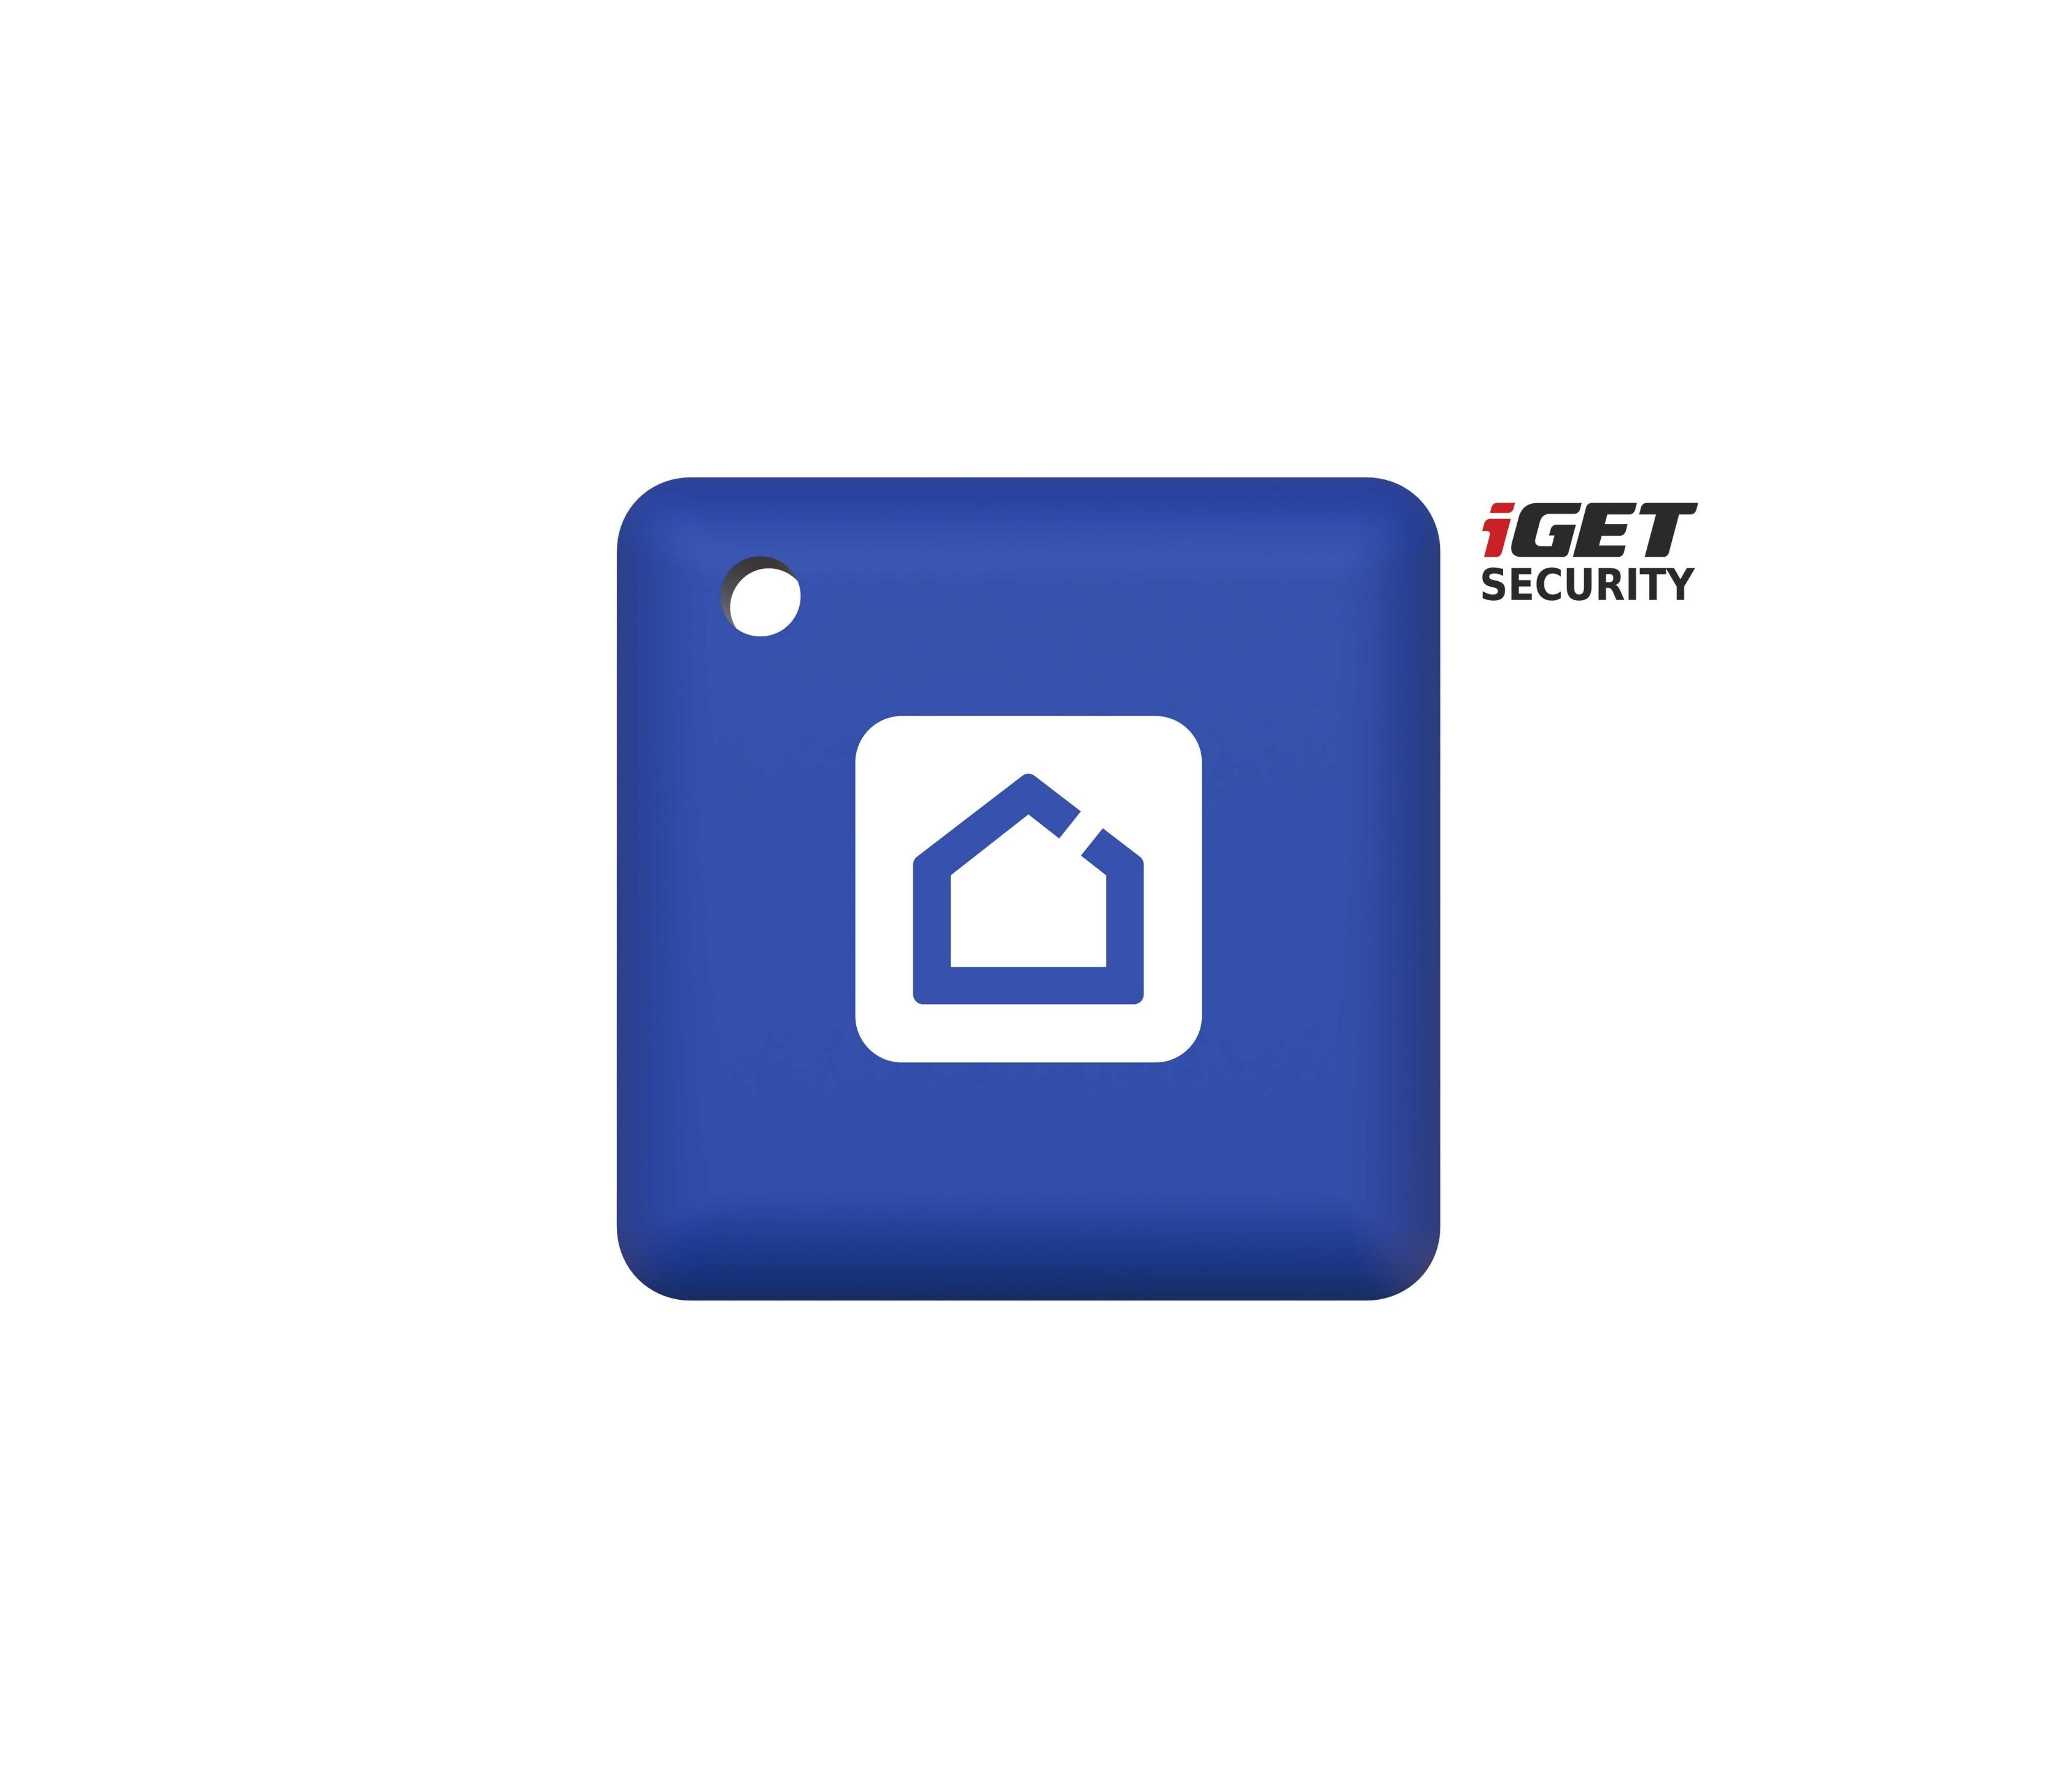 iGET SECURITY EP22 - RFID klíč k klávesnici EP13 pro alarm M5 - EP22